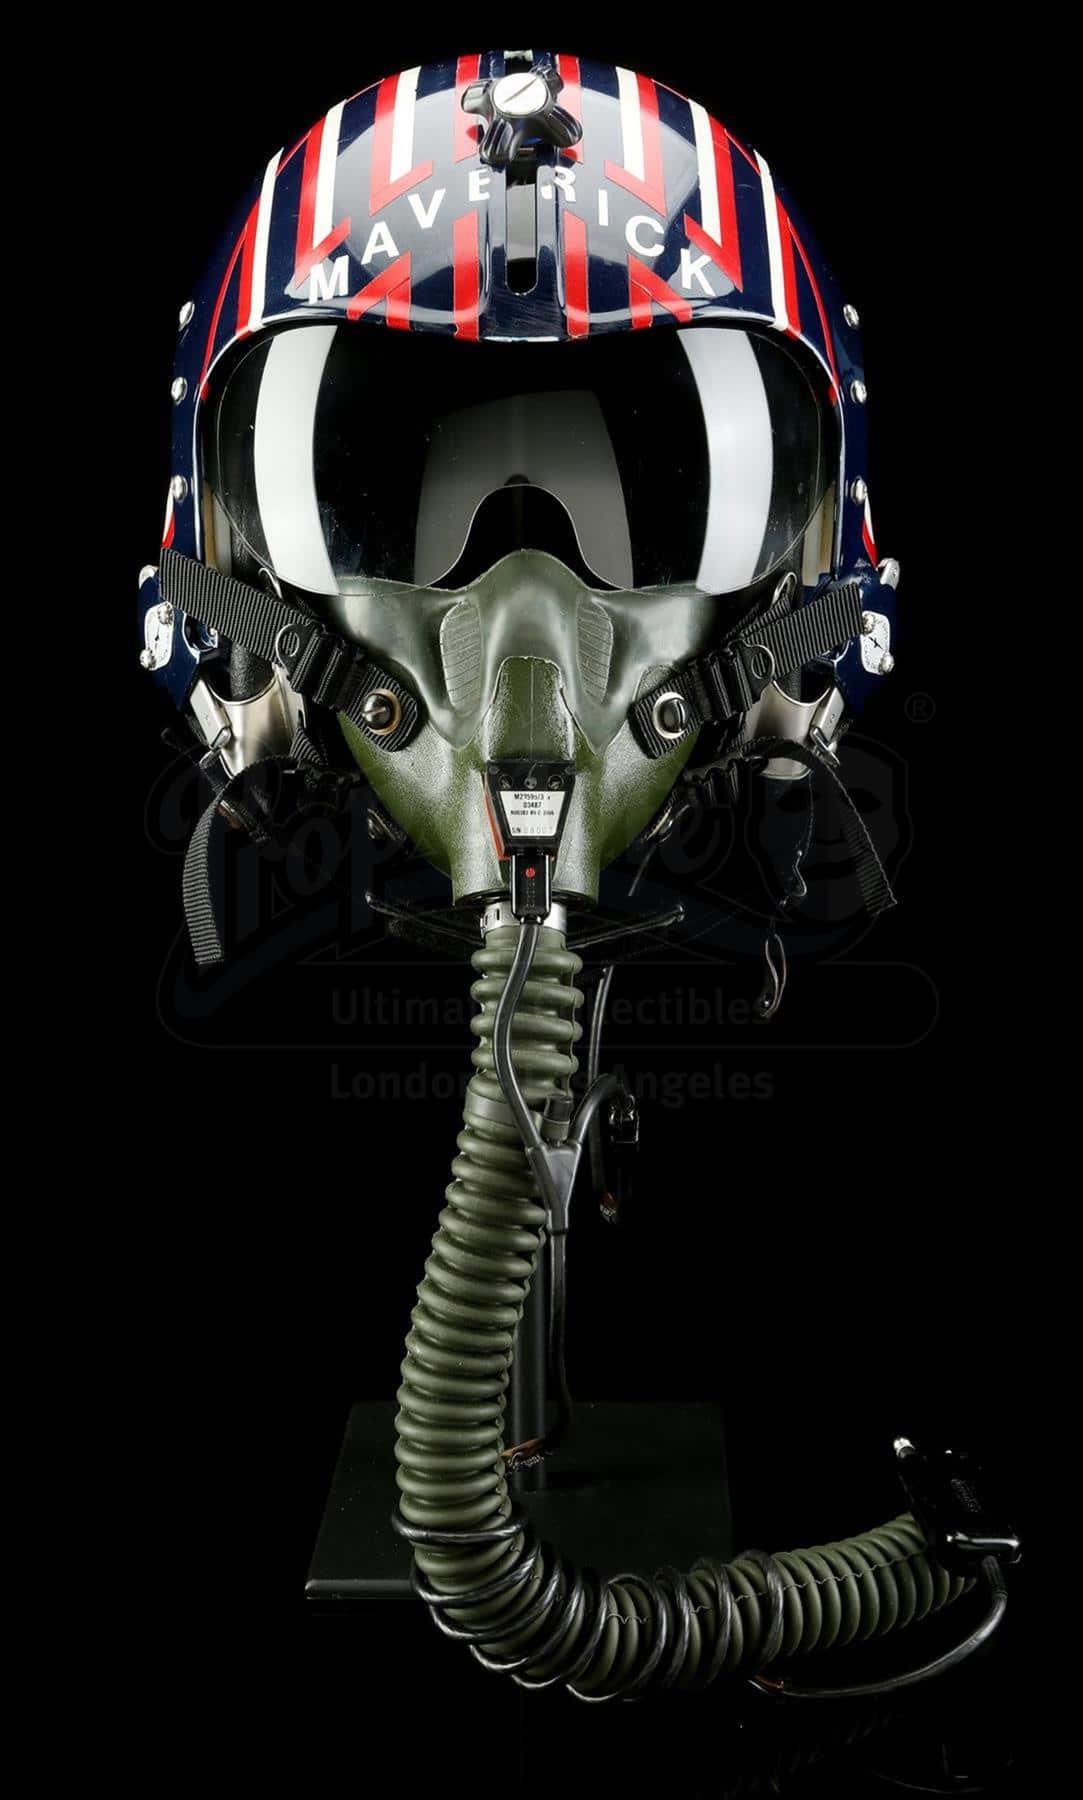 Top Gun - Maverick's Helmet